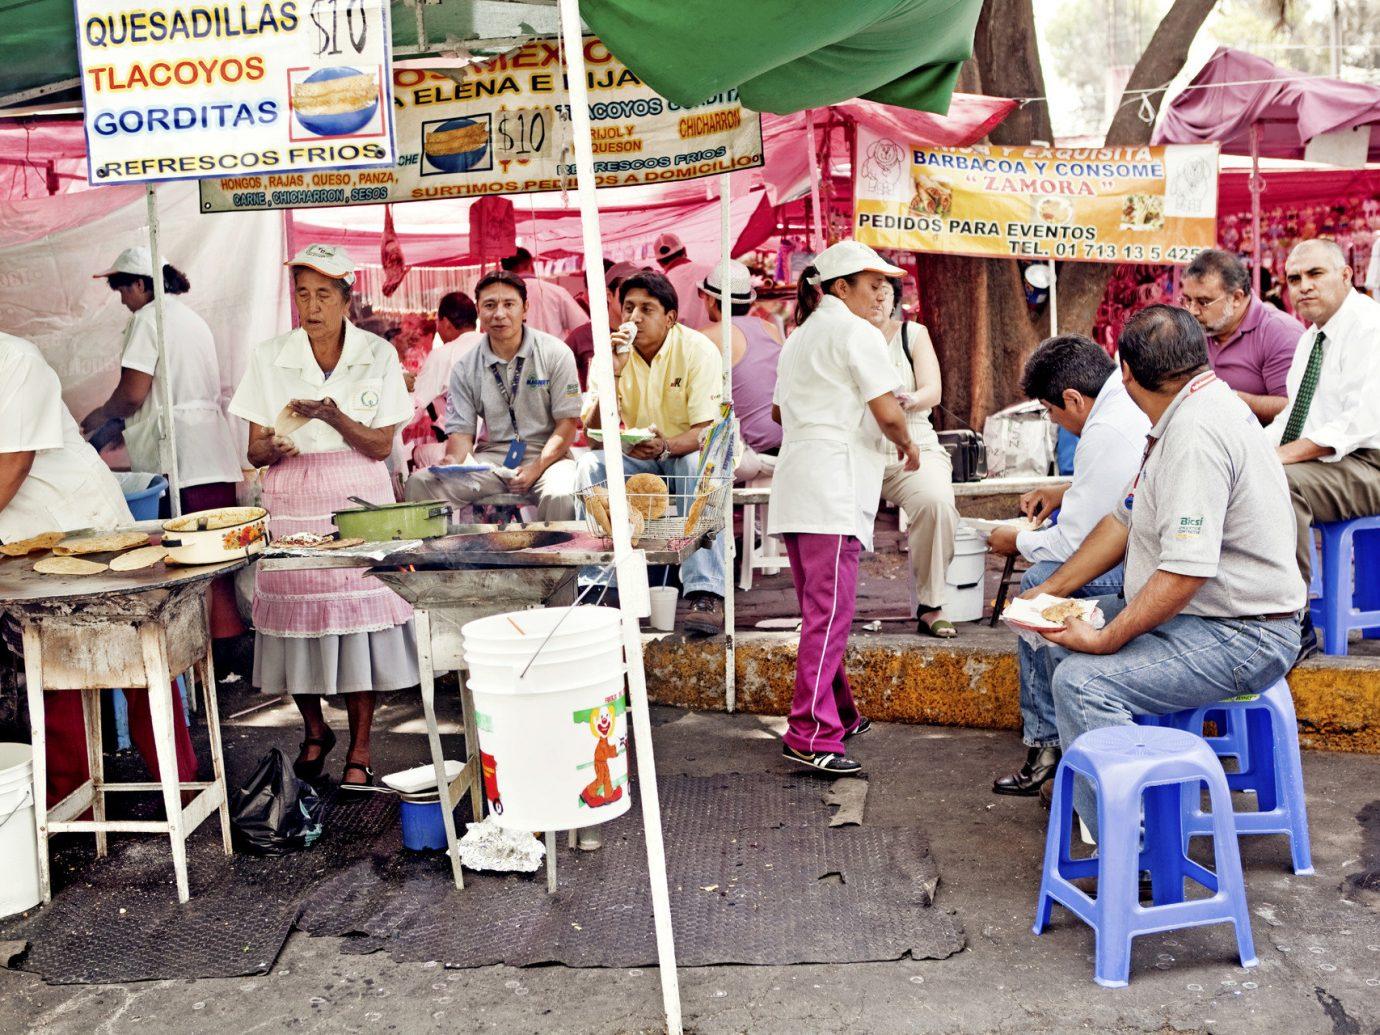 Offbeat Trip Ideas person City public space marketplace vendor market human settlement bazaar street food people group food cuisine stall fair